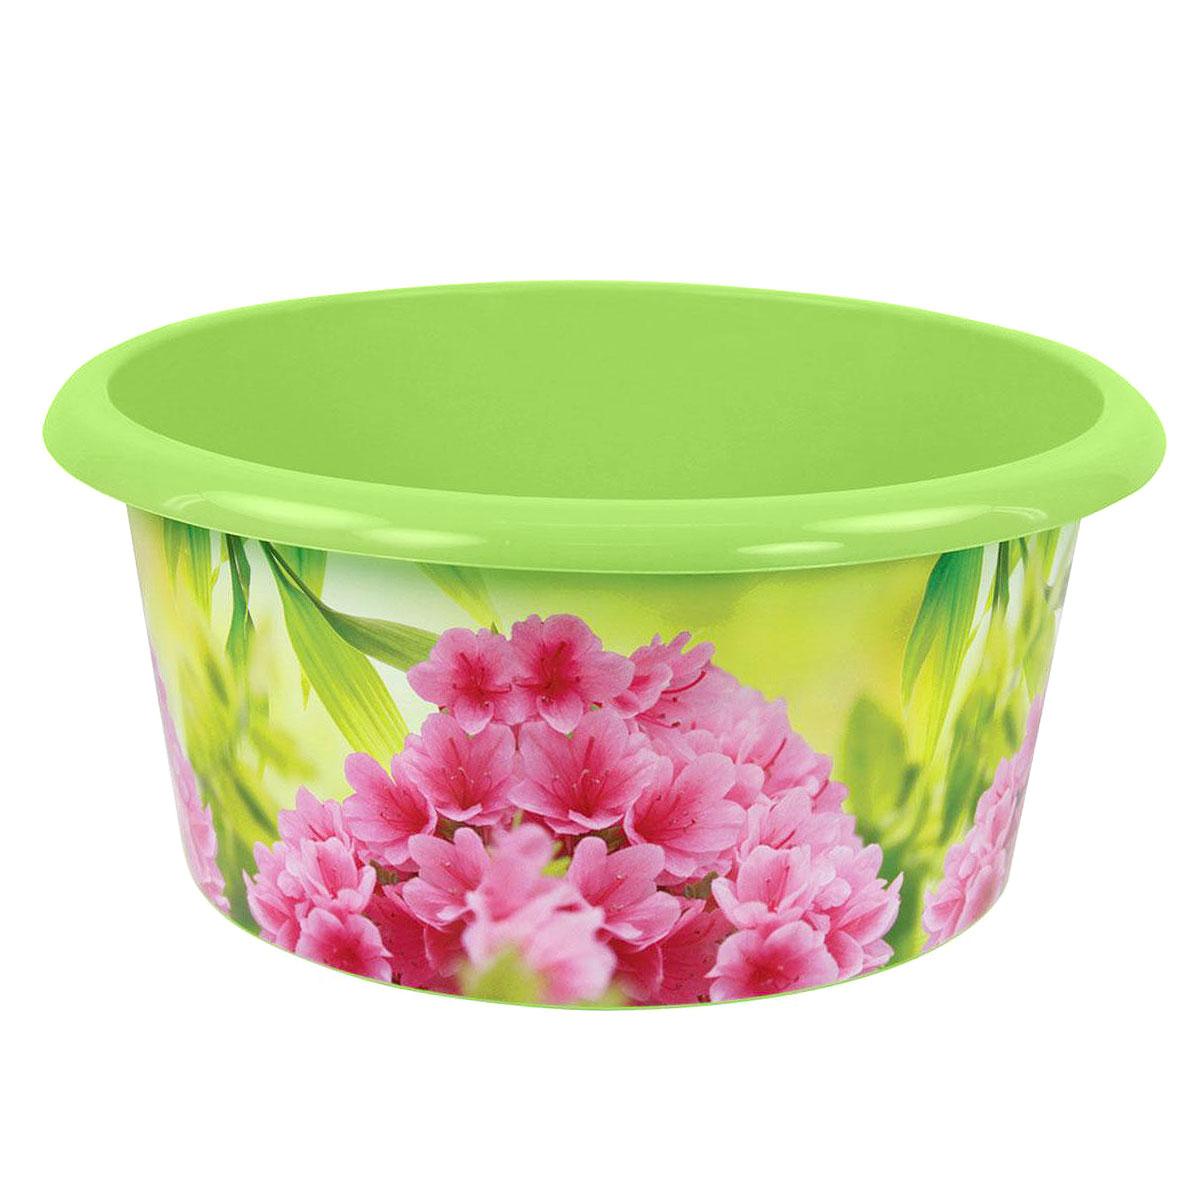 Таз Азалия, цвет: салатовый, 10 л таз азалия объем 10 л цвет зеленый 952965